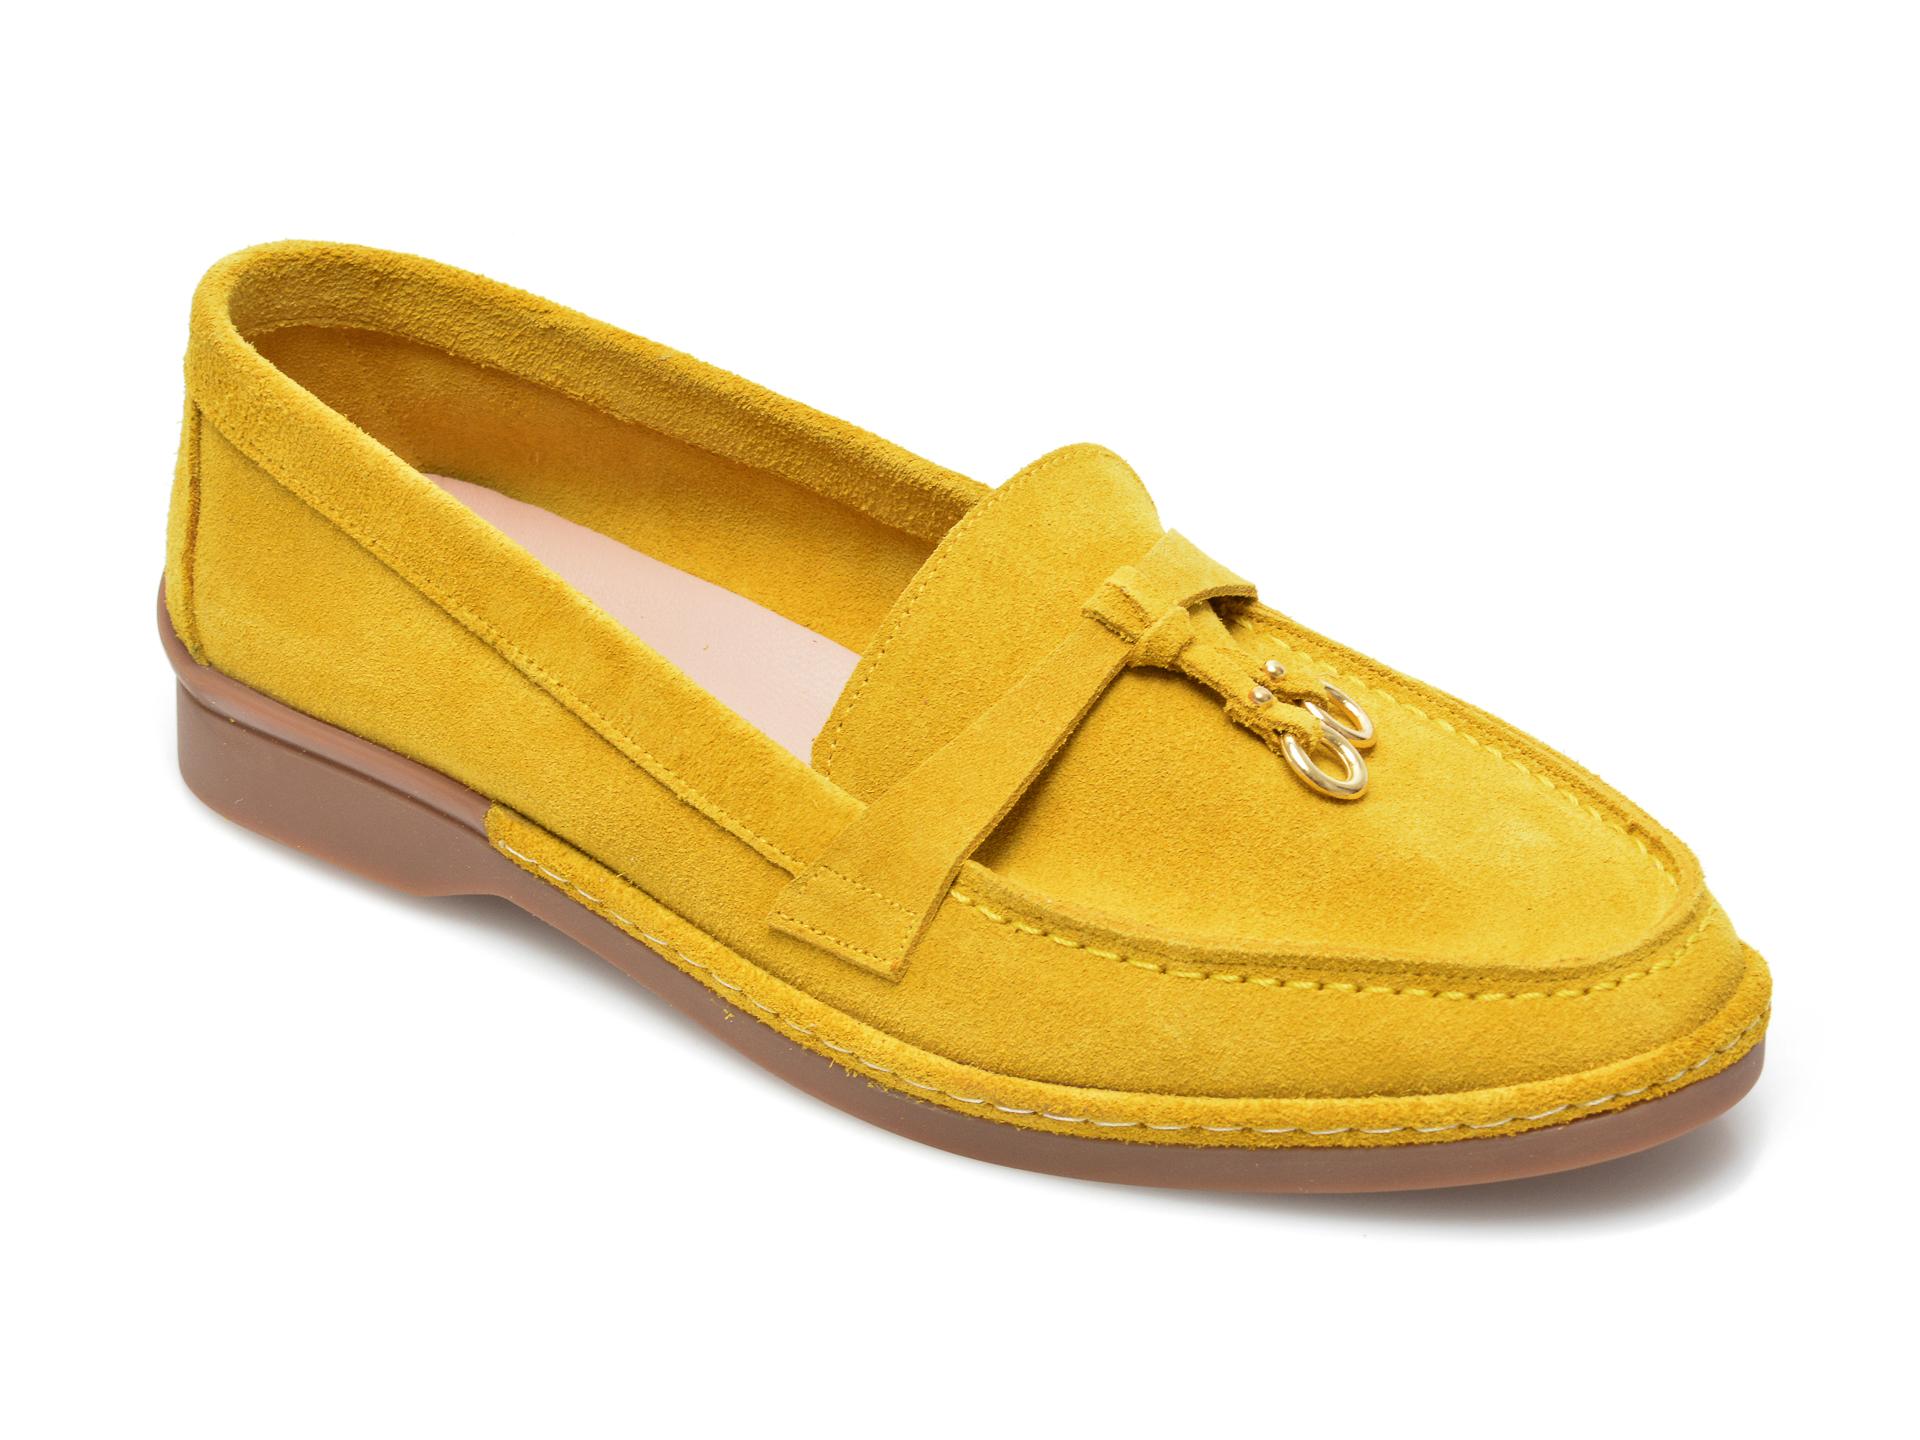 Pantofi IMAGE galbeni, 838, din piele intoarsa imagine otter.ro 2021